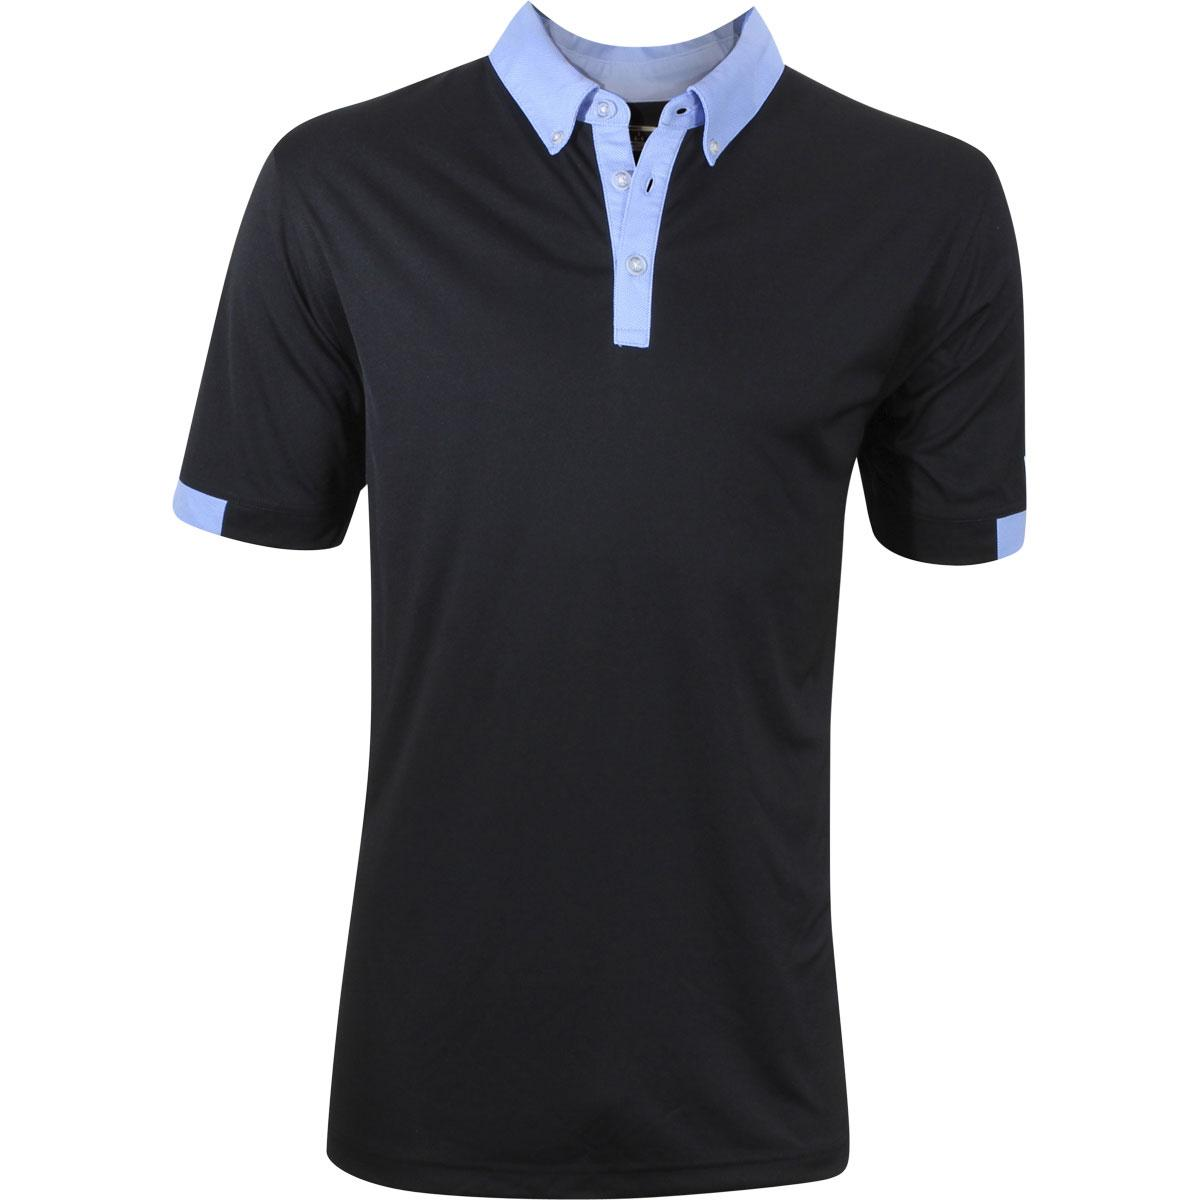 Image of Callaway Men's Blocked Polo Short Sleeve Shirt - Caviar - Classic Fit